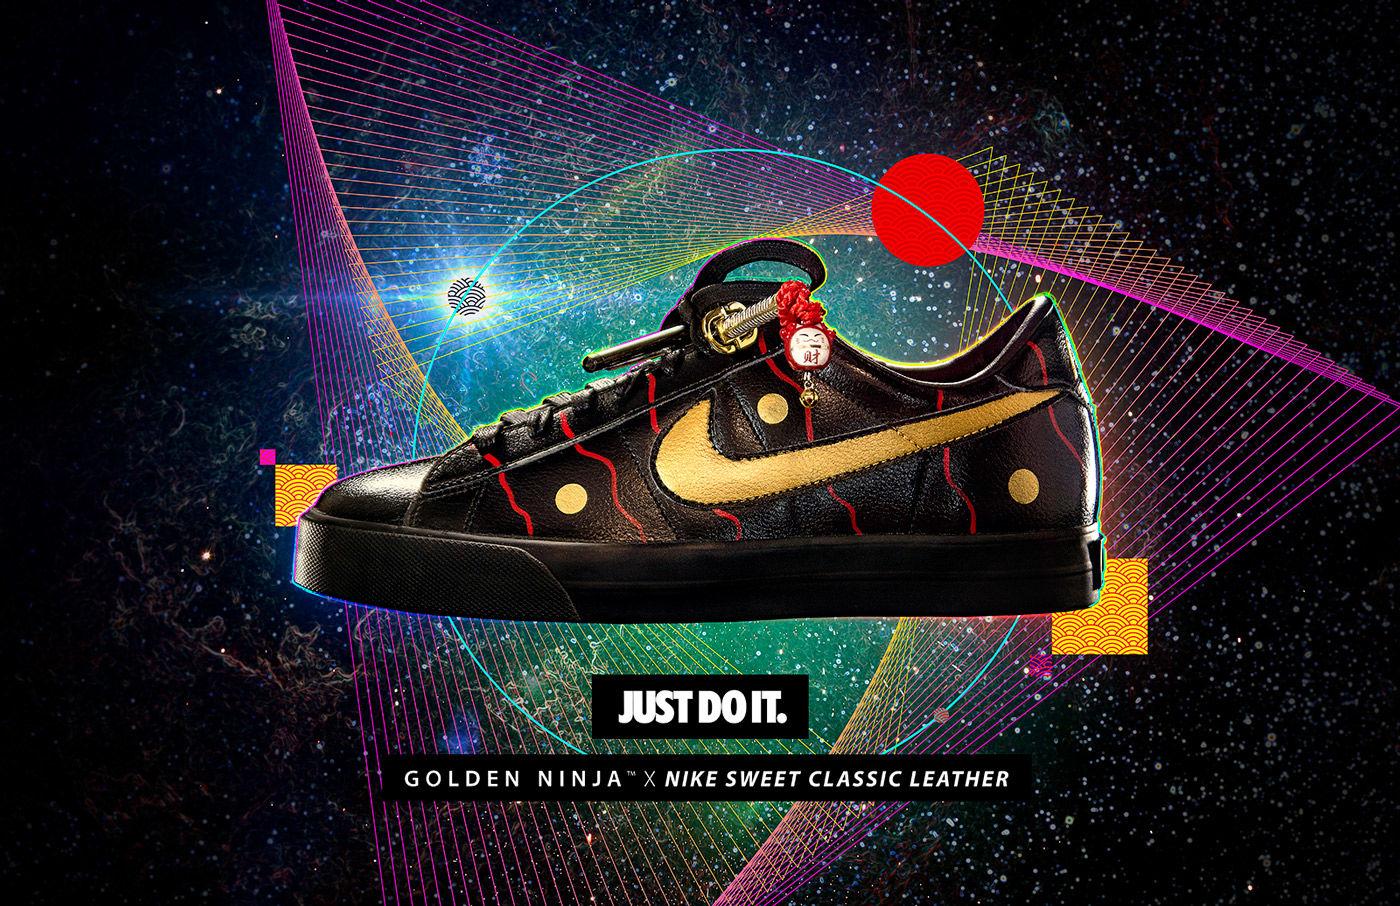 0_1477013937847_GOLDEN-NINJA-Nike-Classic-Sneaker-1400-wallpaper.jpg